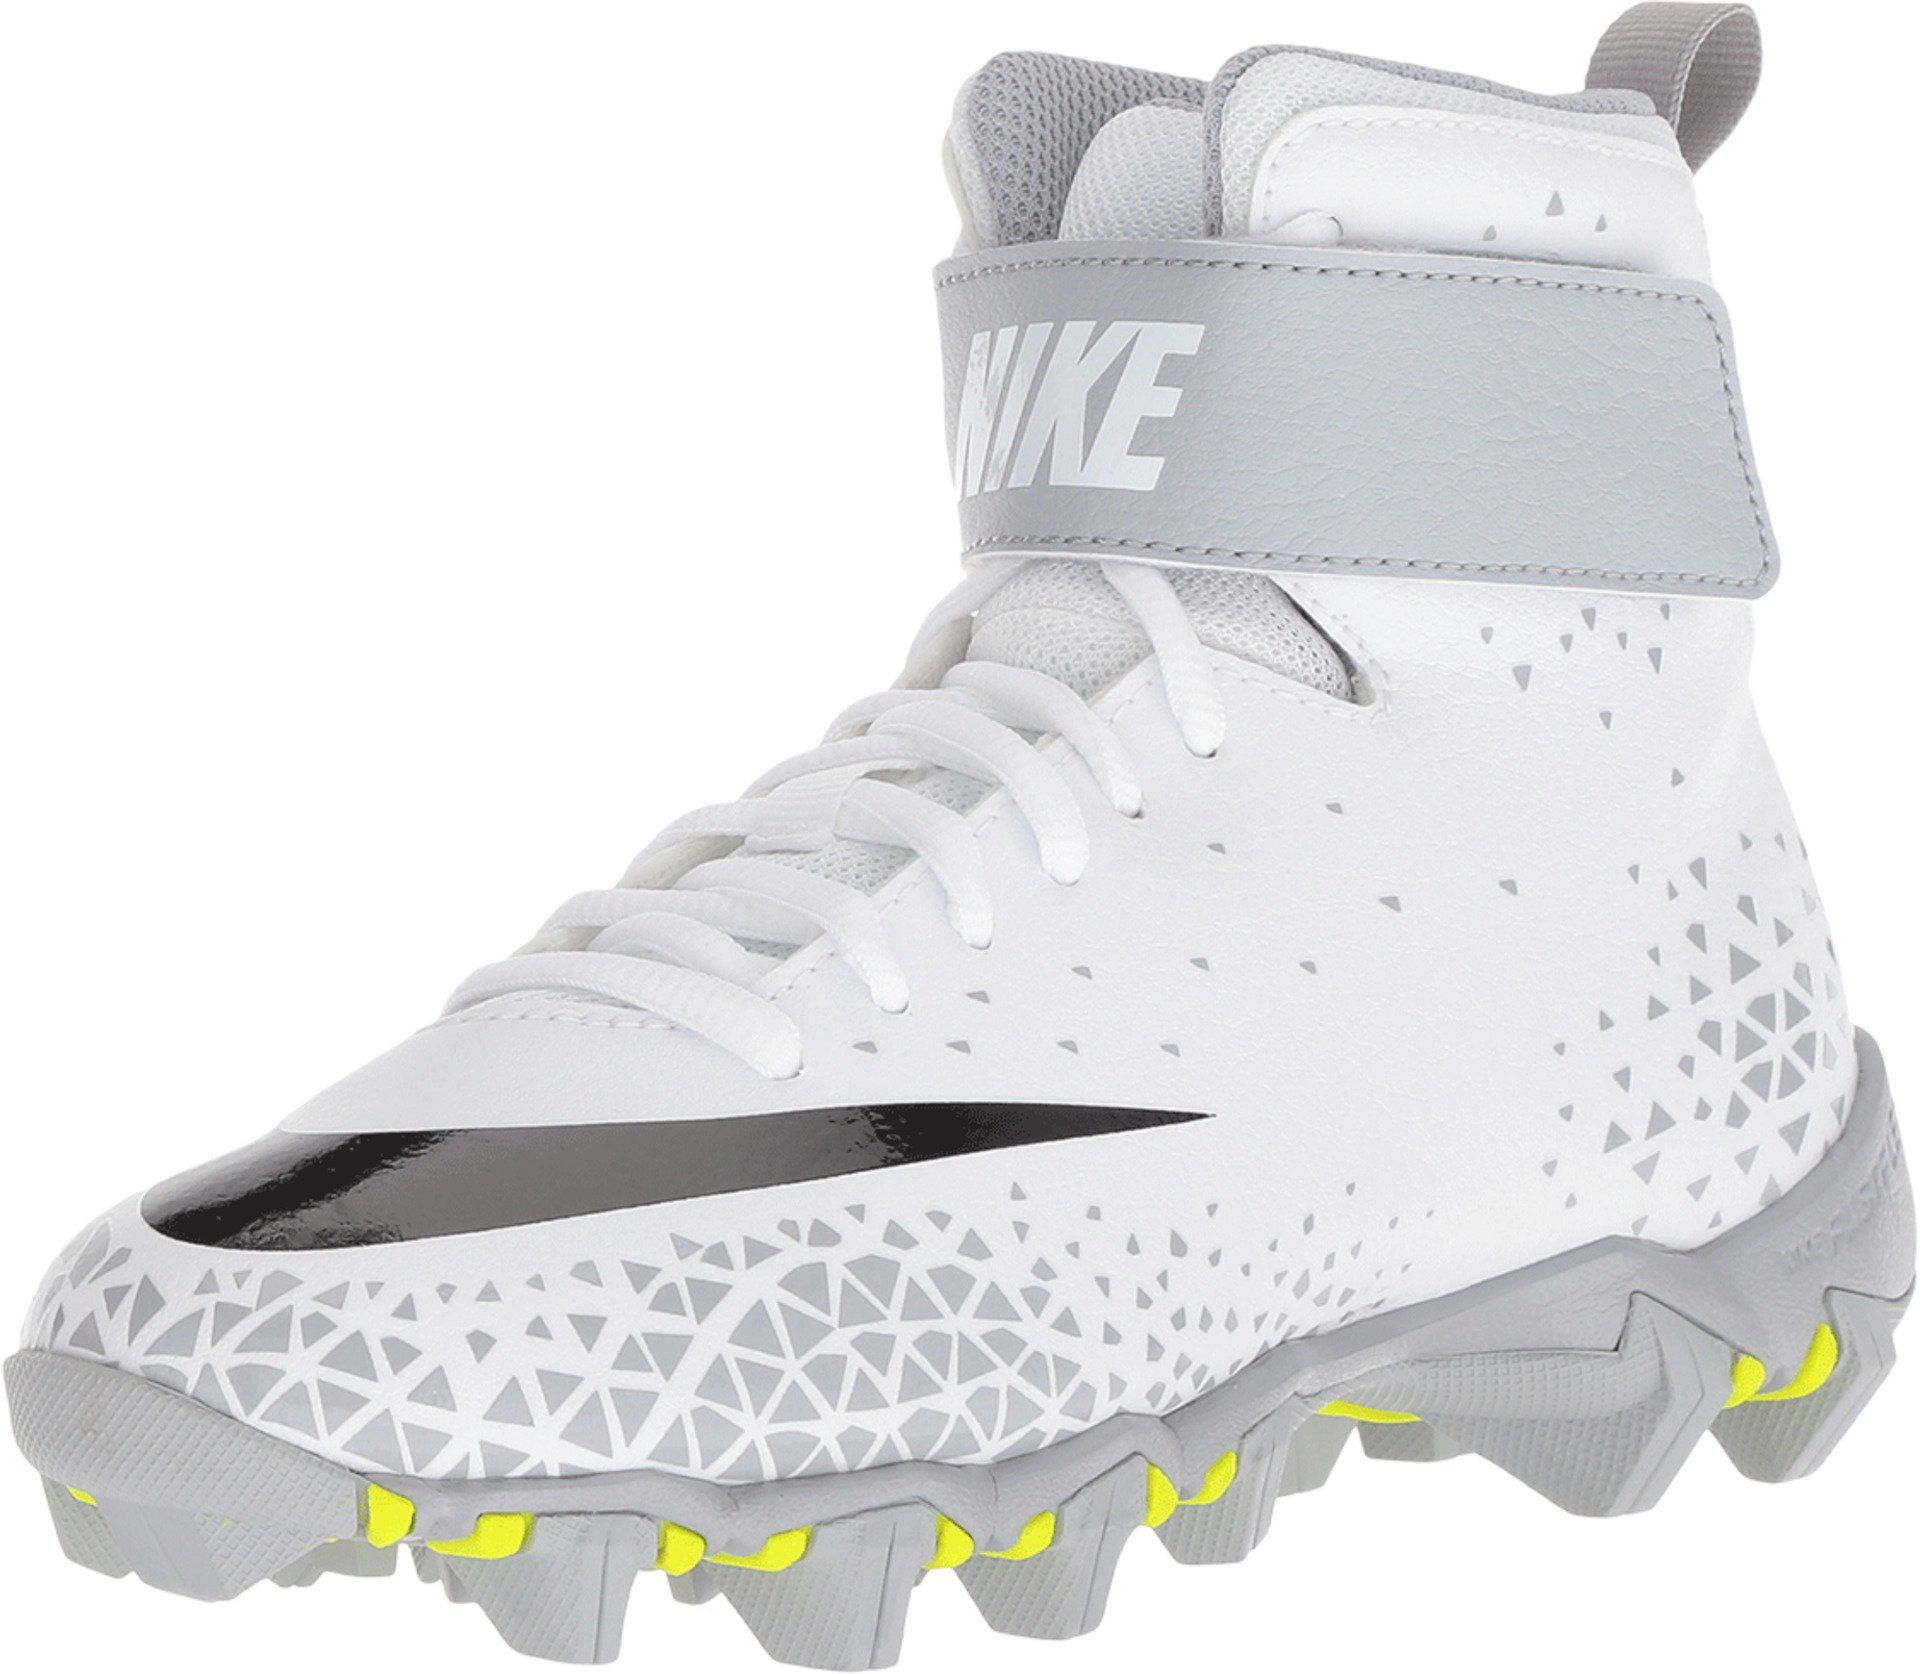 Nike Grade School Force Savage Shark Football Cleats (3Y, White/Black/Wolf Grey)